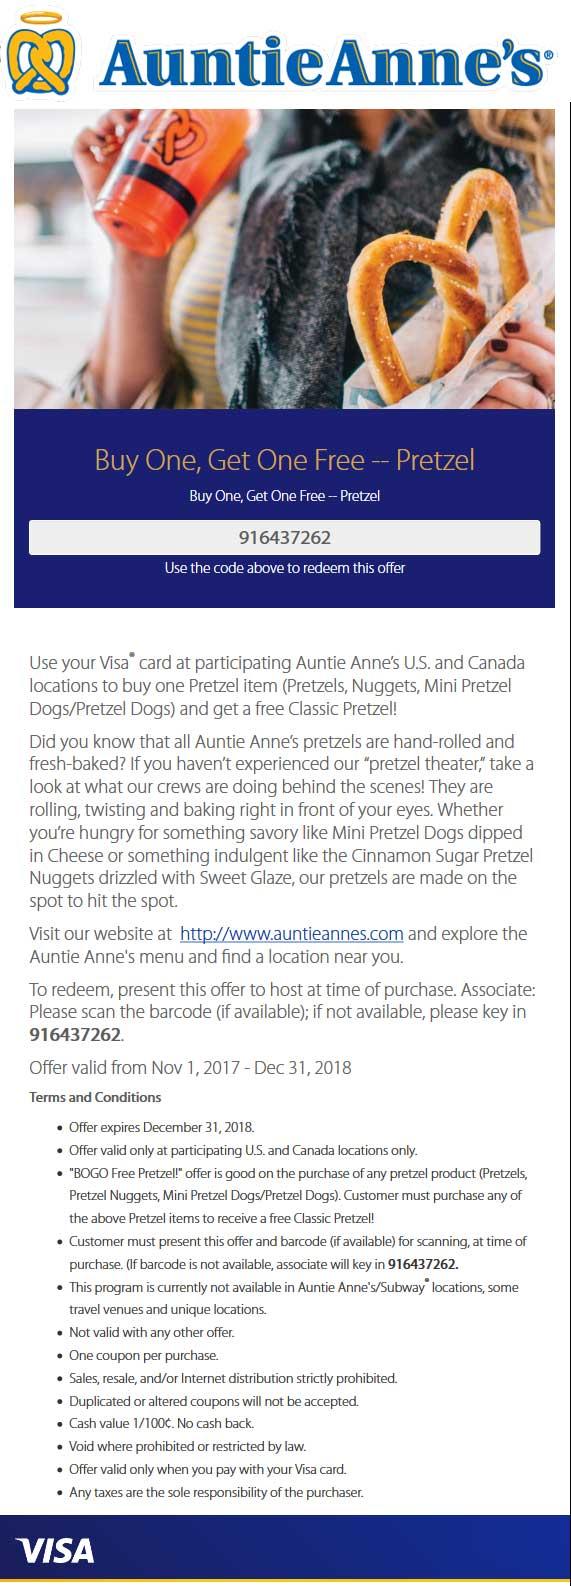 Auntie Annes Coupon October 2018 Second pretzel free at Auntie Annes restaurants